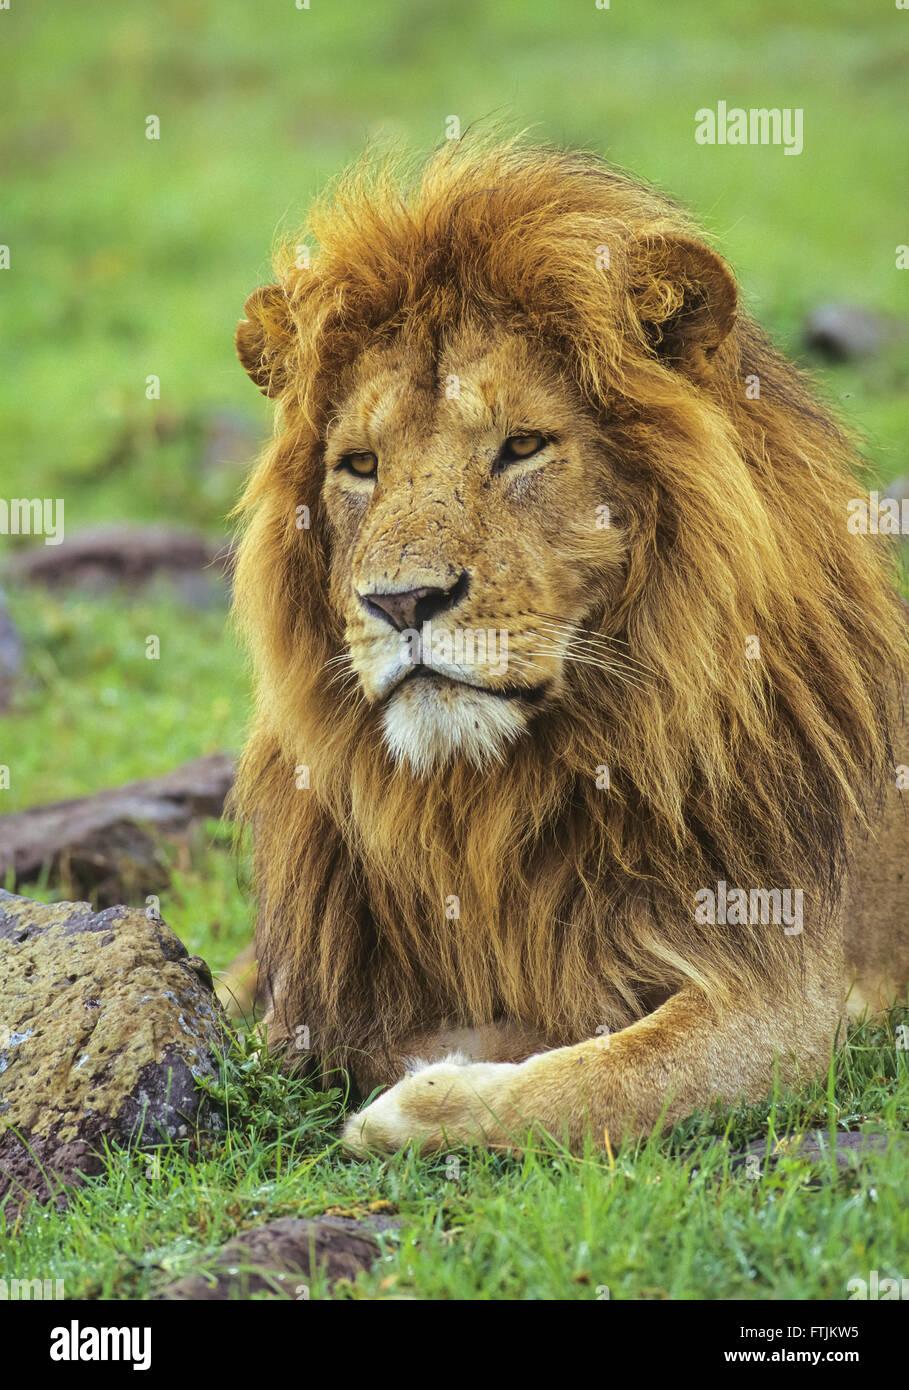 African male lion portrait - Stock Image